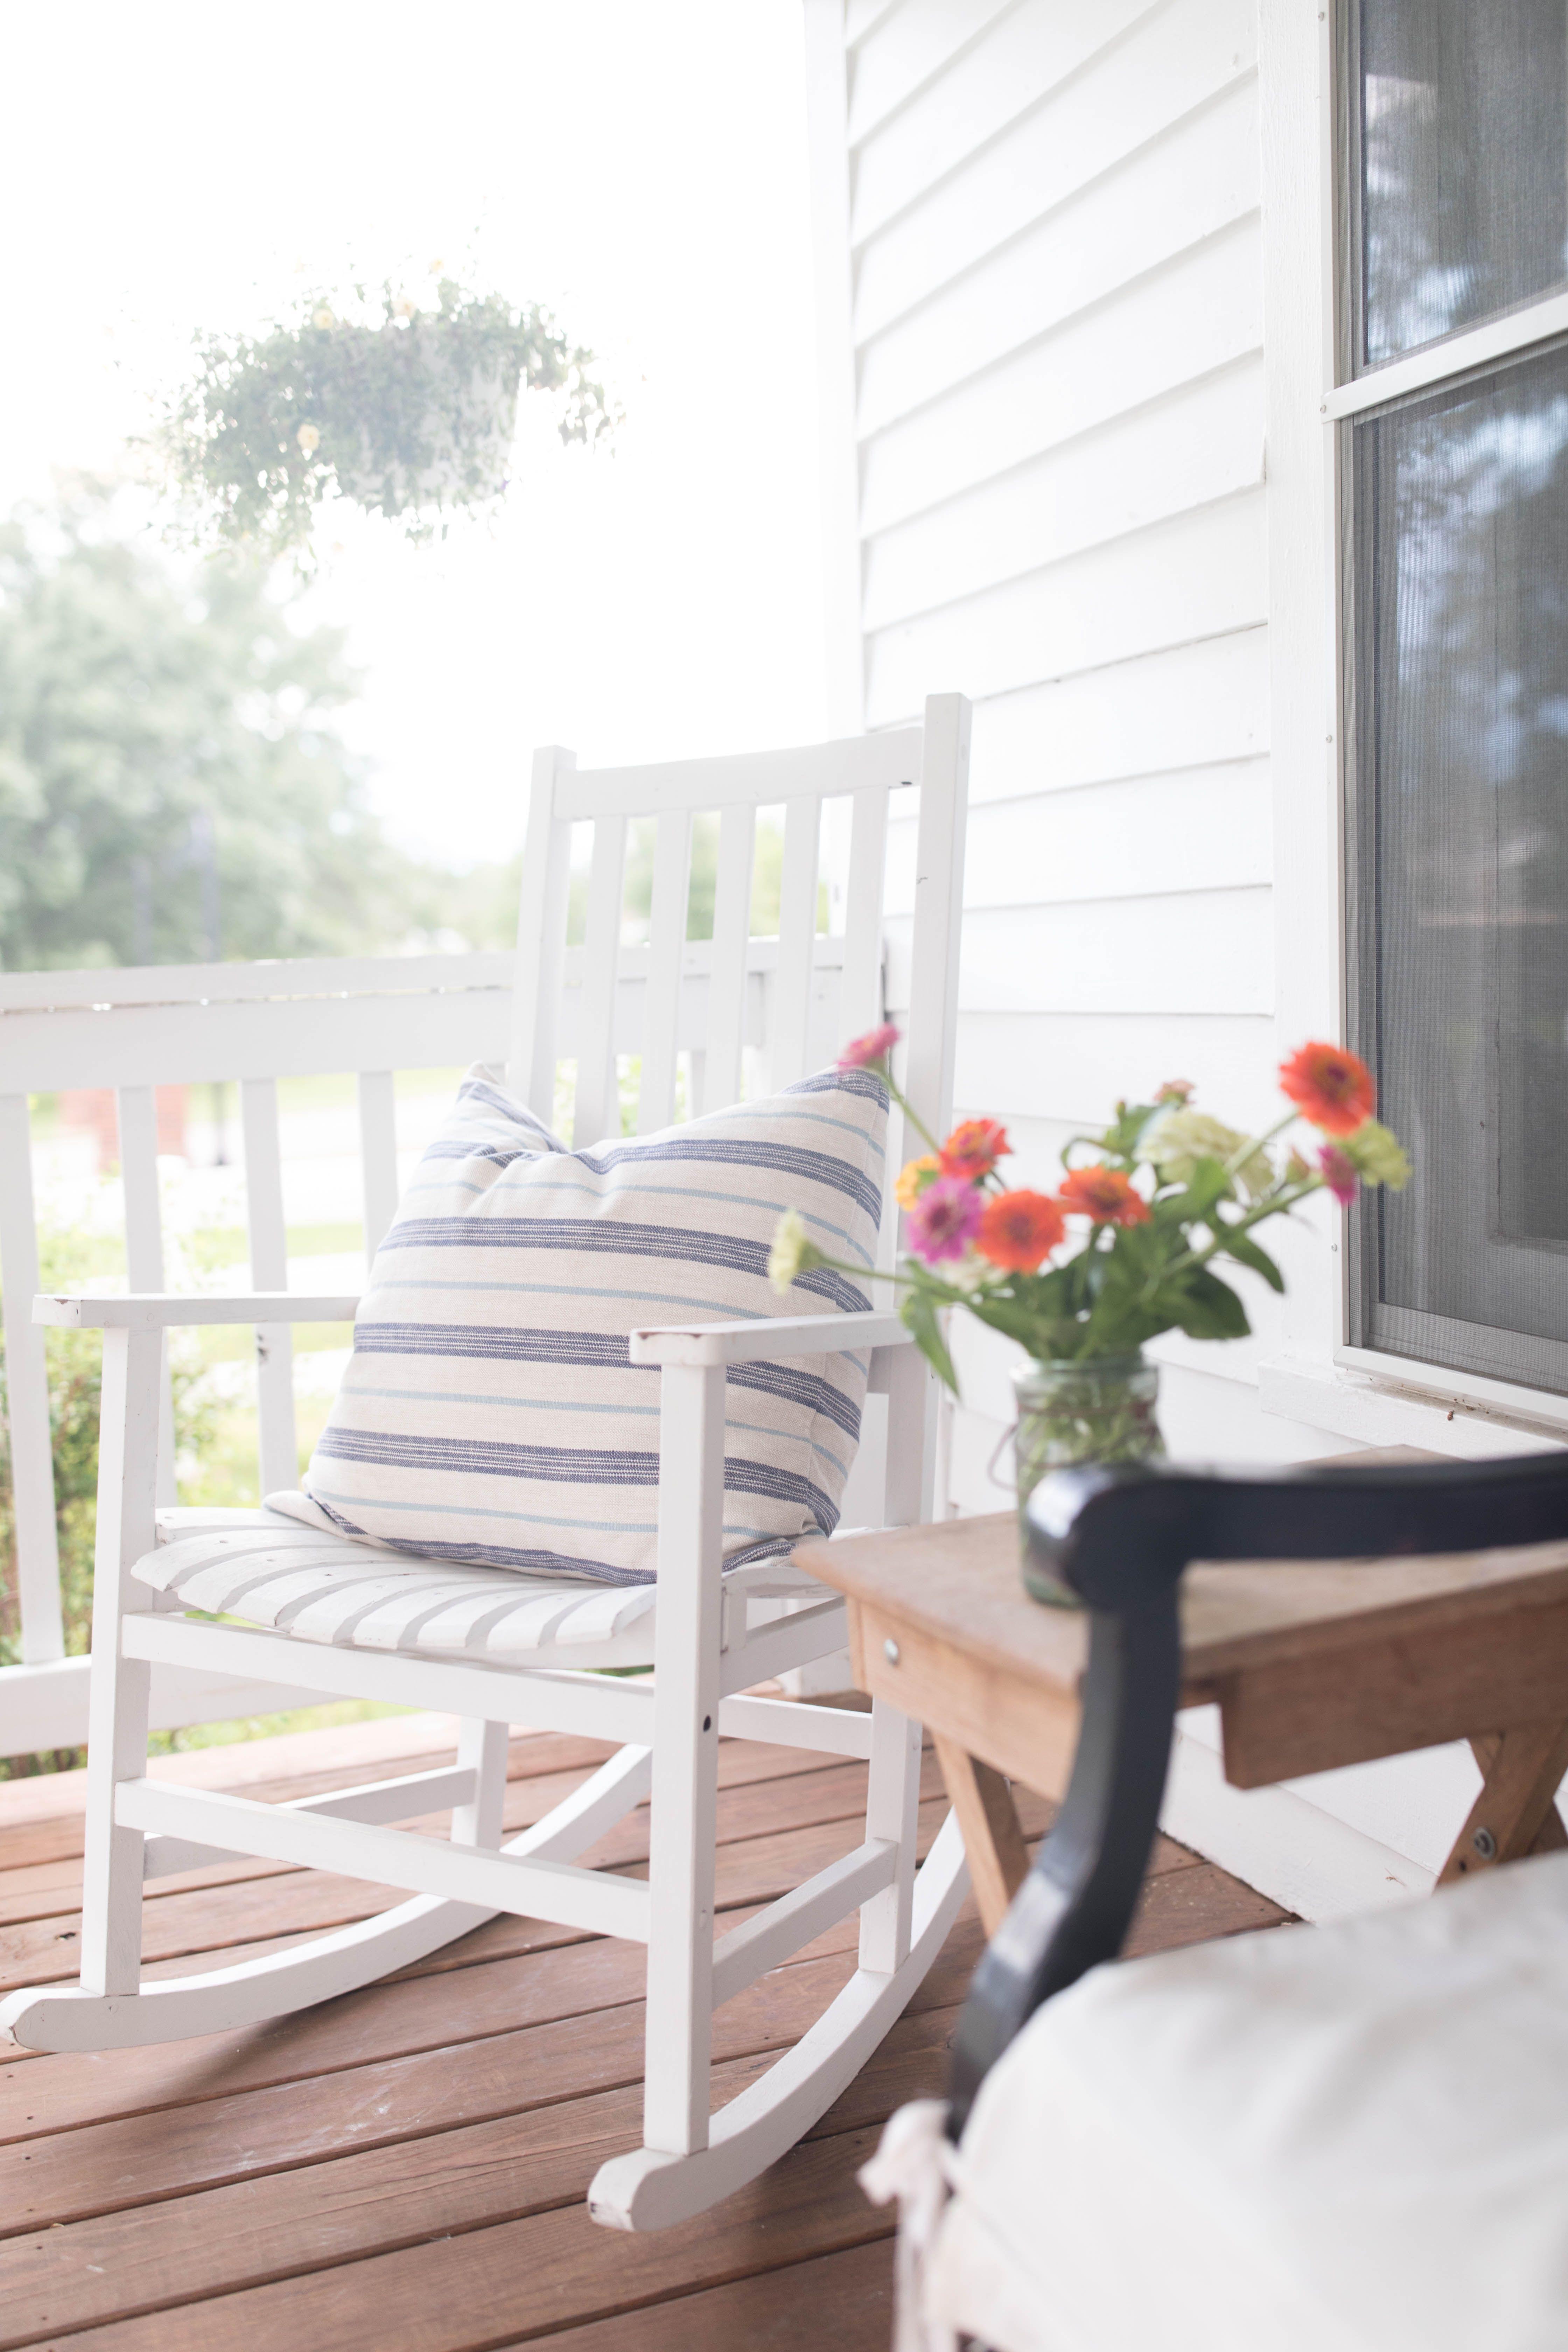 Superb White Rocking Chair With Blue Striped Pillow On Porch 5 Creativecarmelina Interior Chair Design Creativecarmelinacom